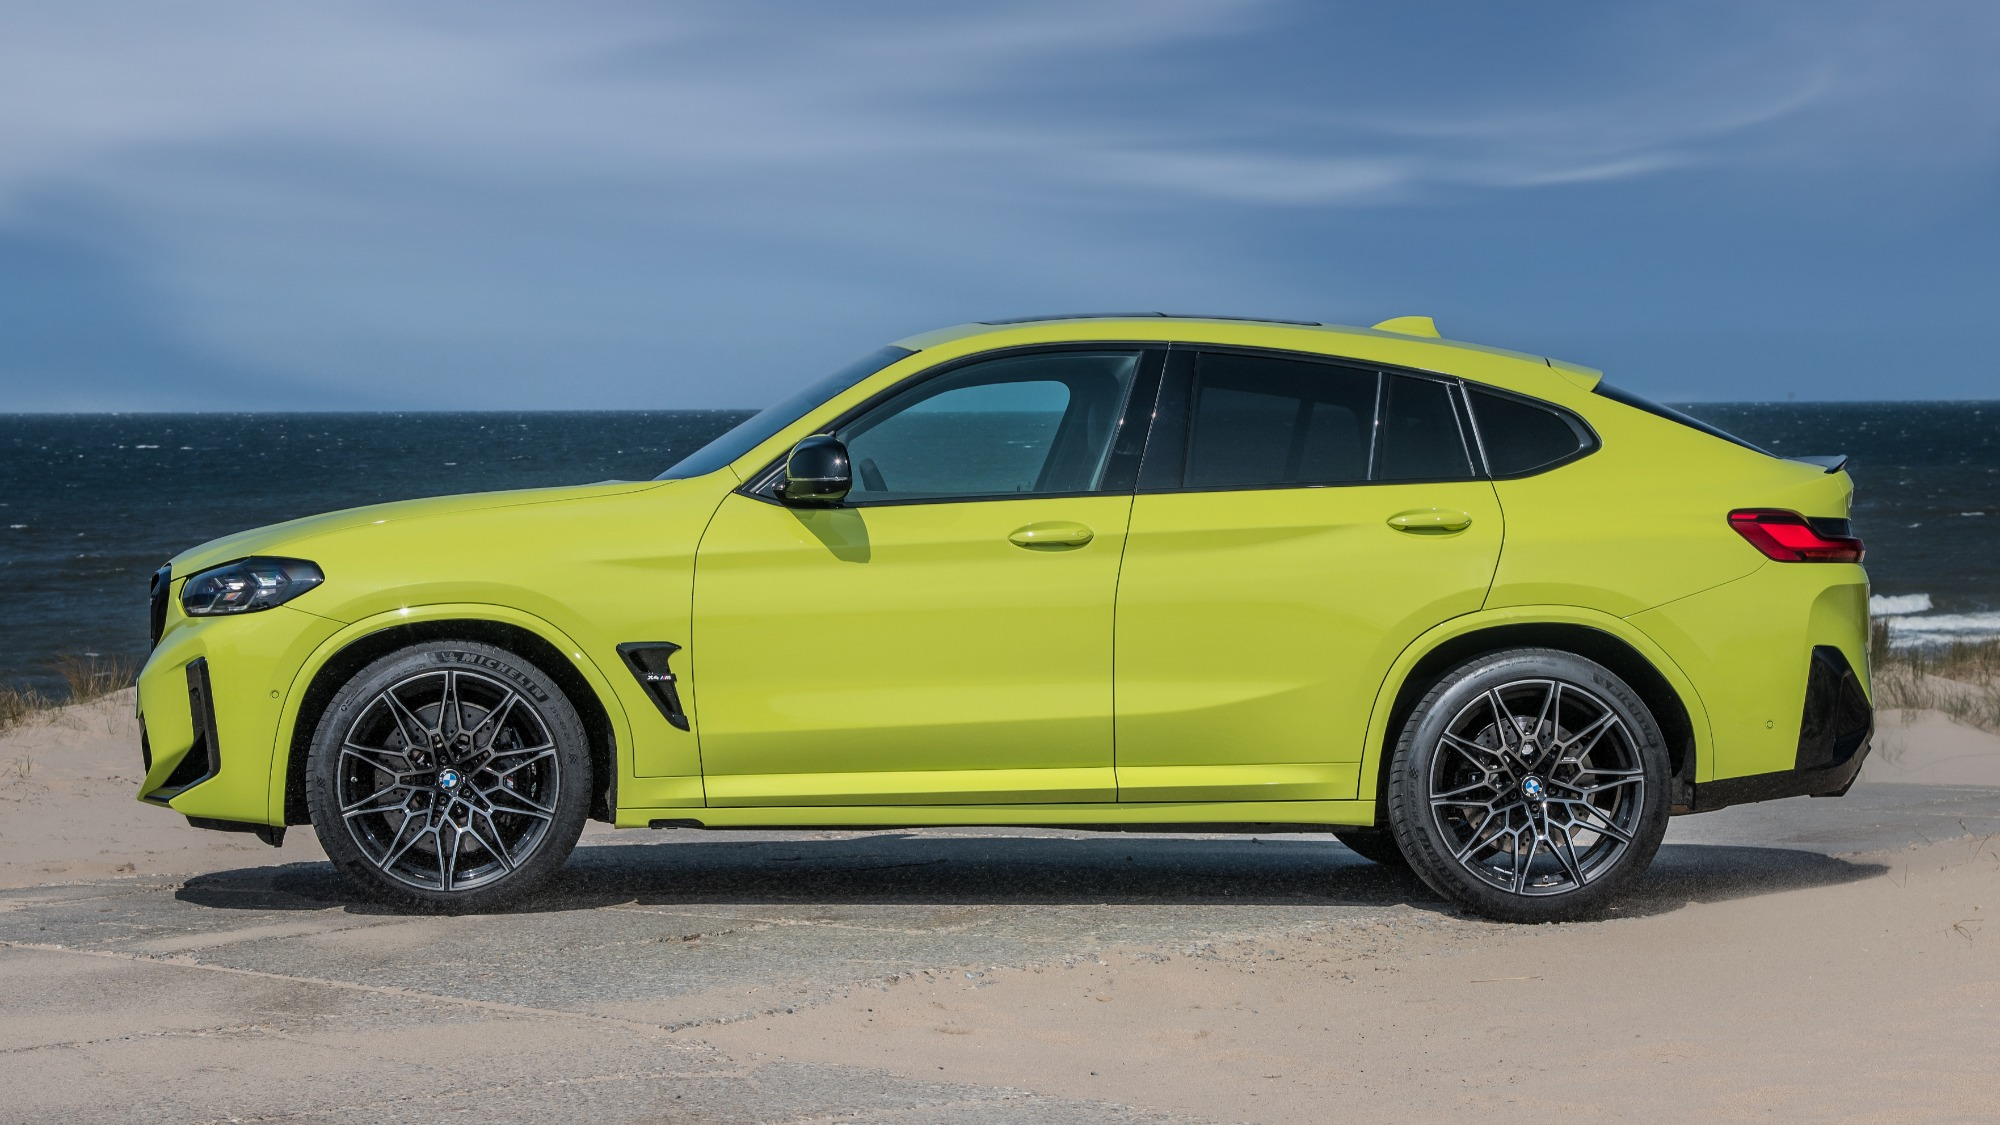 BMW X4 M Competition 2022 verde visto de lado